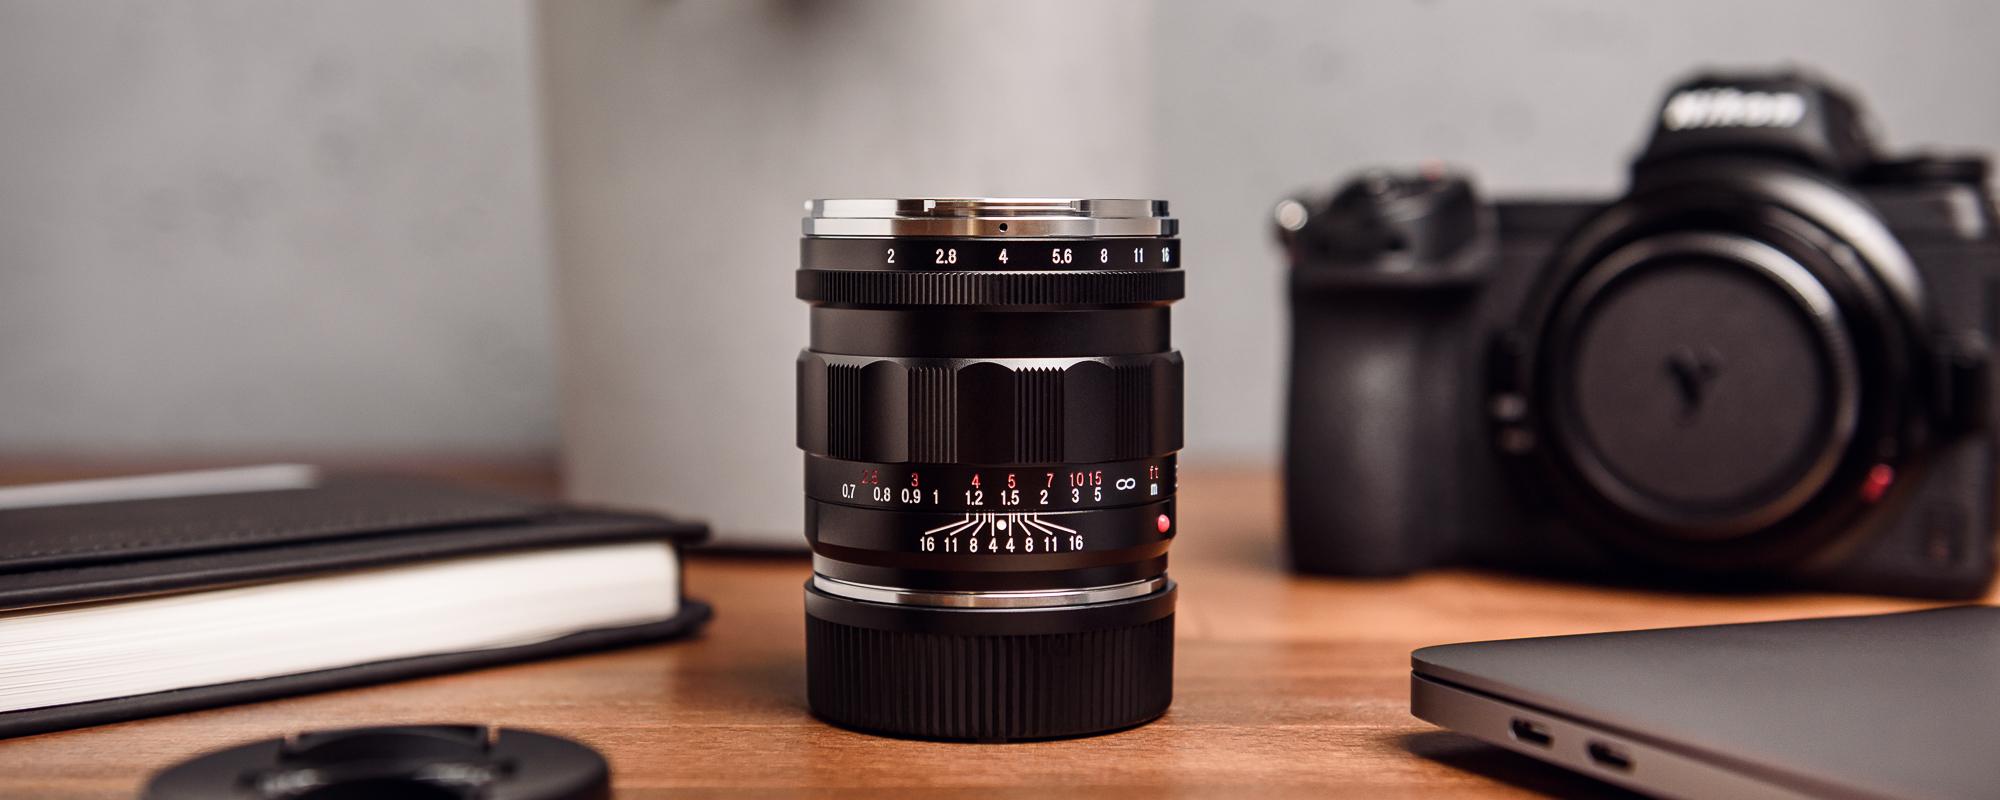 Voigtlander APO Lanthar 50 mm f/2.0 lens for Leica M - all-metal barrel